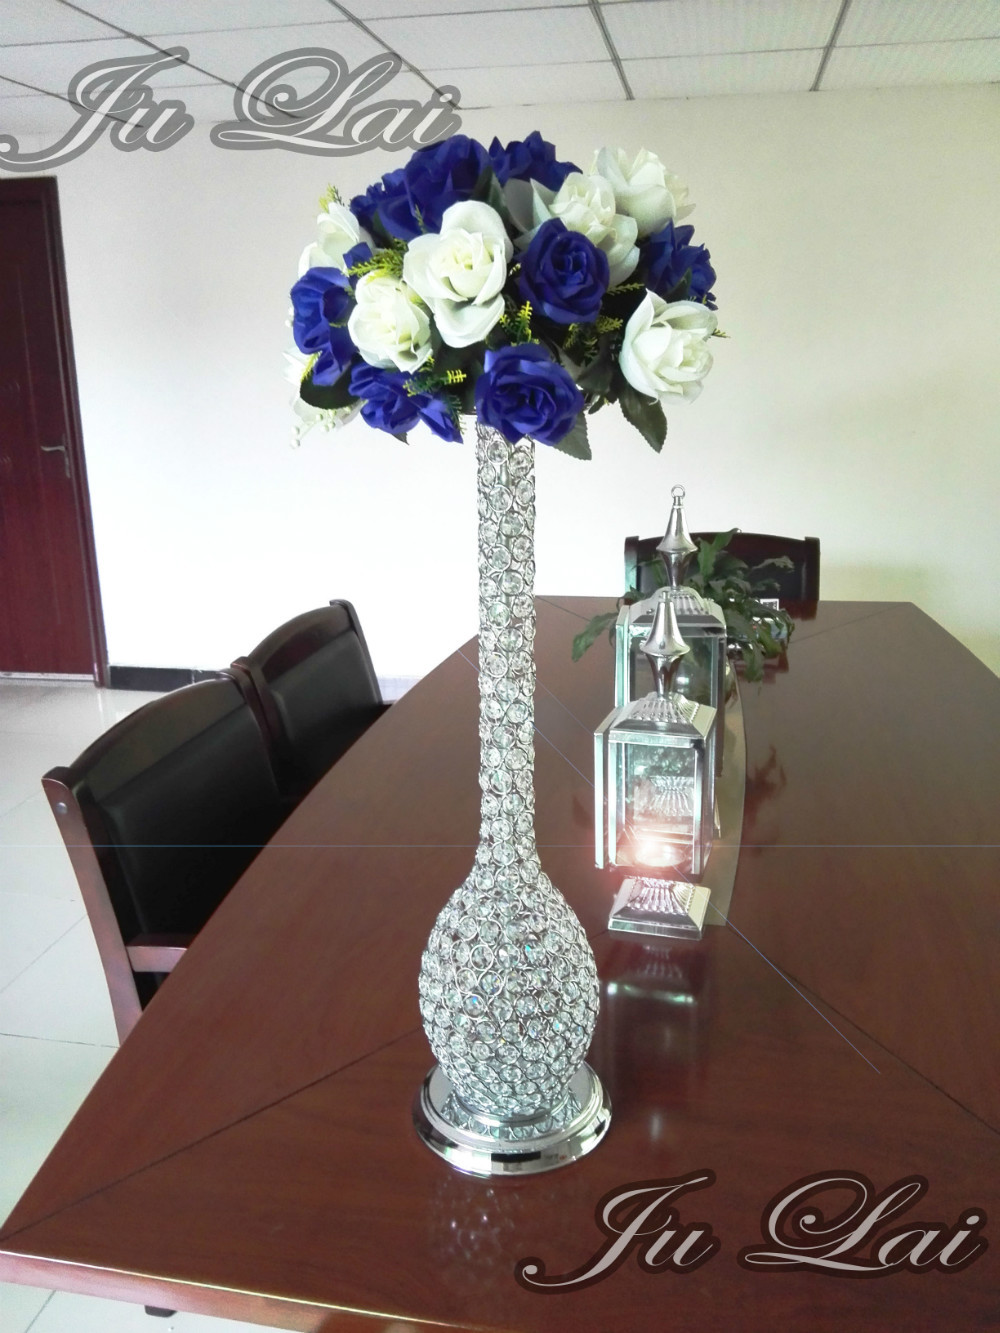 Newwedding table flower standsflower vase for wedding table newwedding table flower standsflower vase for wedding table centerpieces wedding decoration reviewsmspy